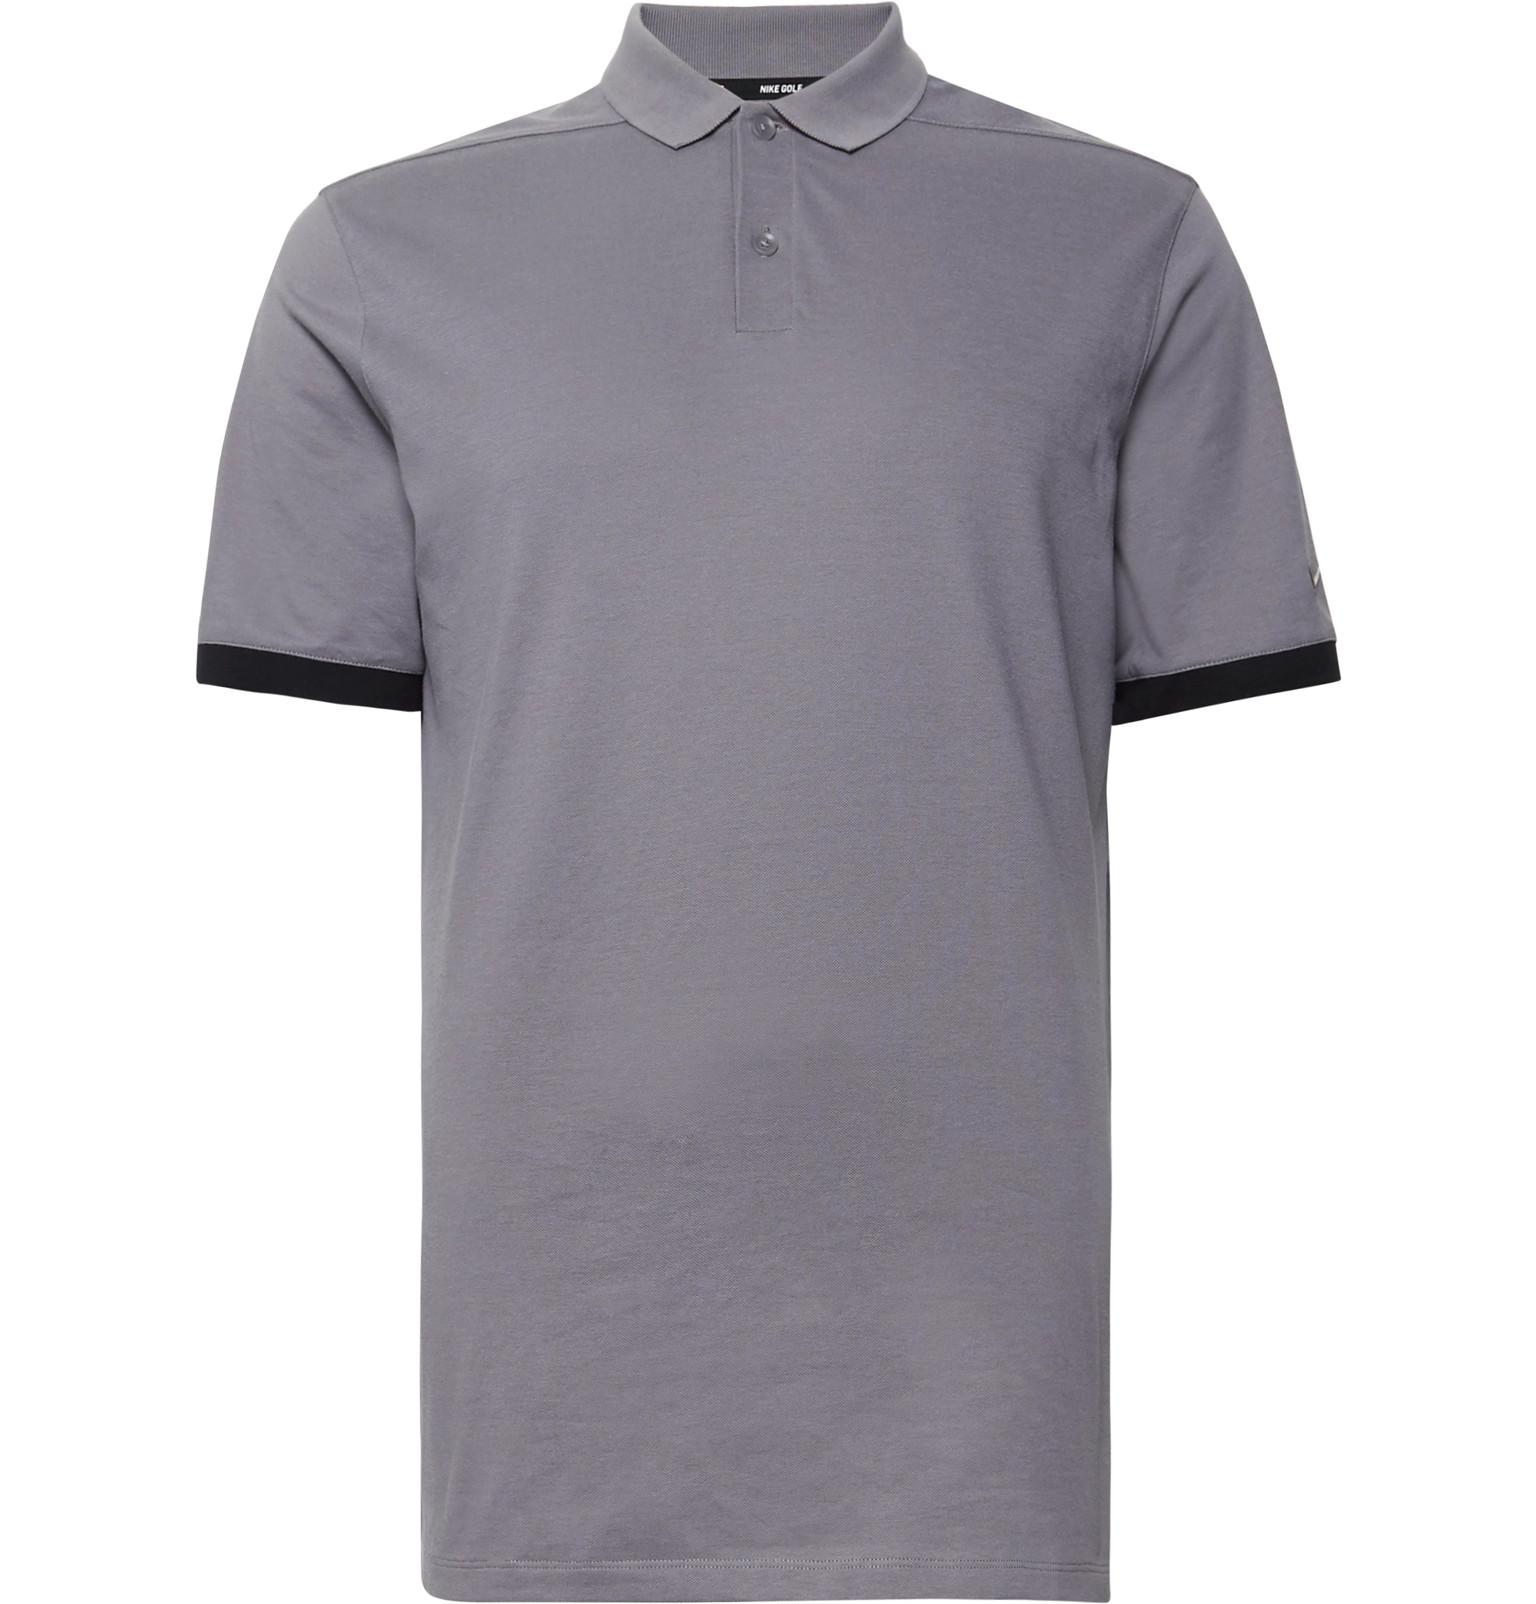 Nike Golf Contrast Trimmed Dri Fit Piqu Golf Polo Shirt